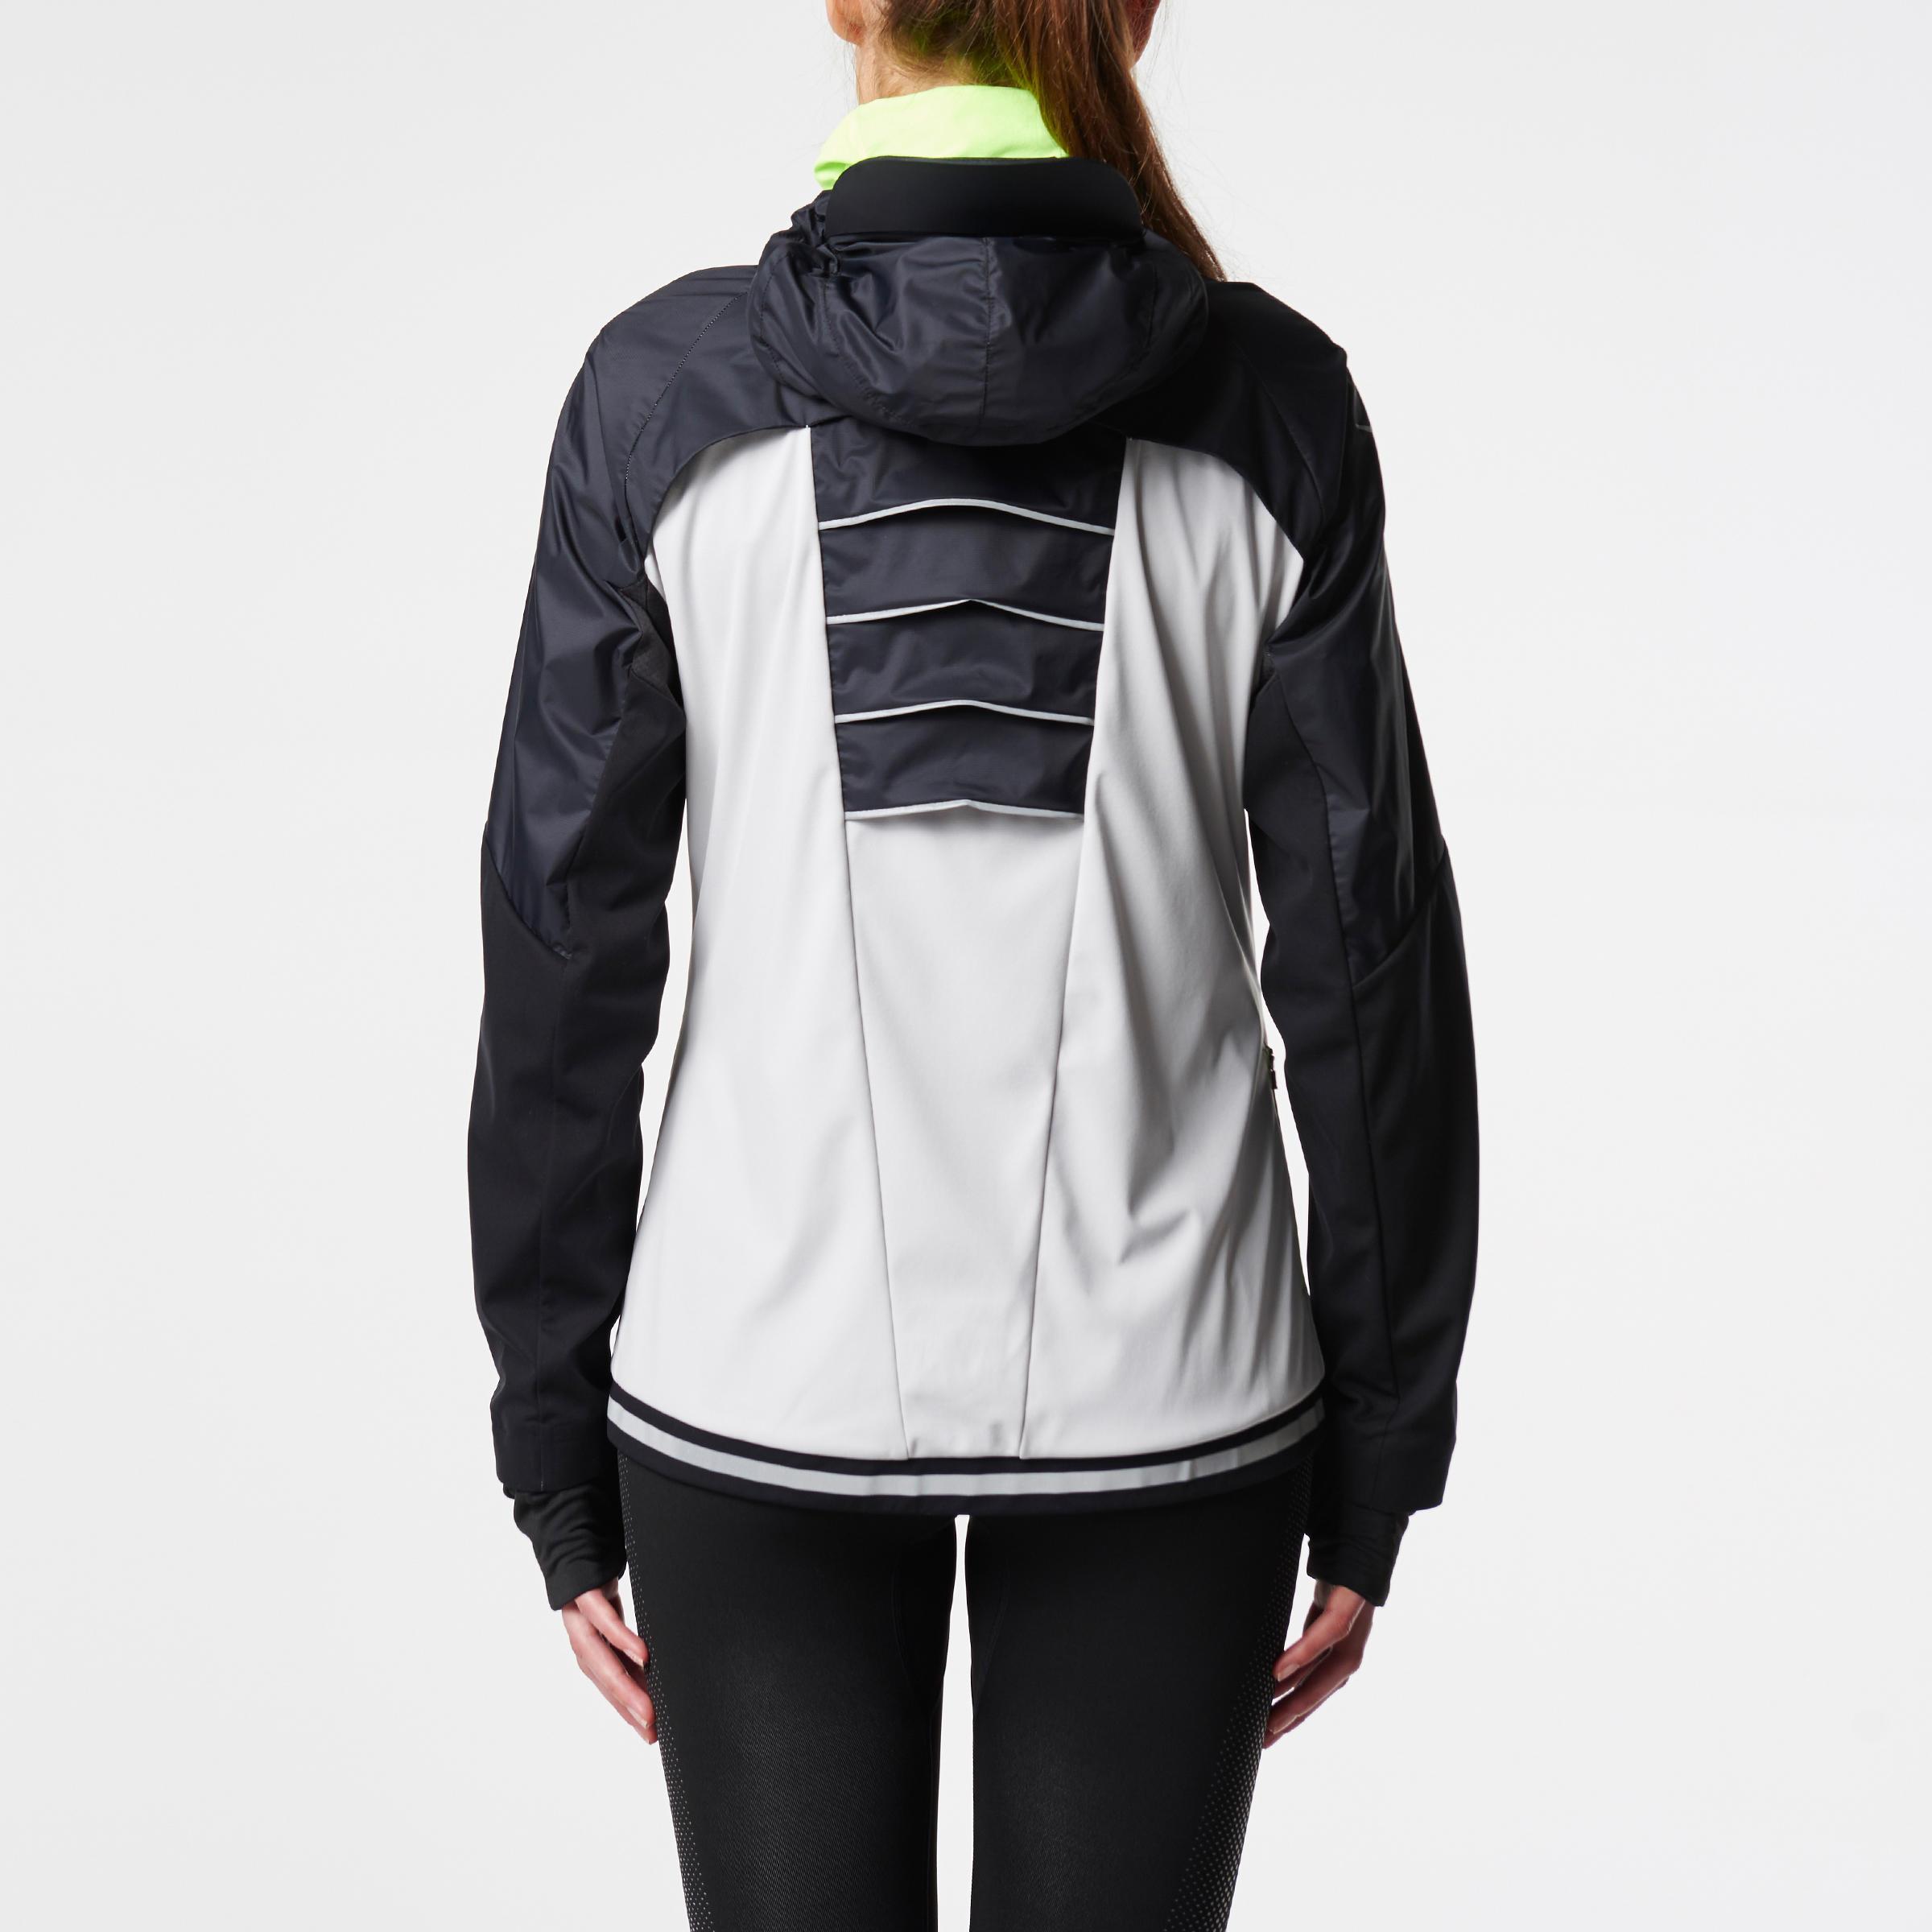 design de qualité 9a60e 86ca1 Femme Running Gris Kiprun Noir Pale Evolutiv Kalenji Veste ...